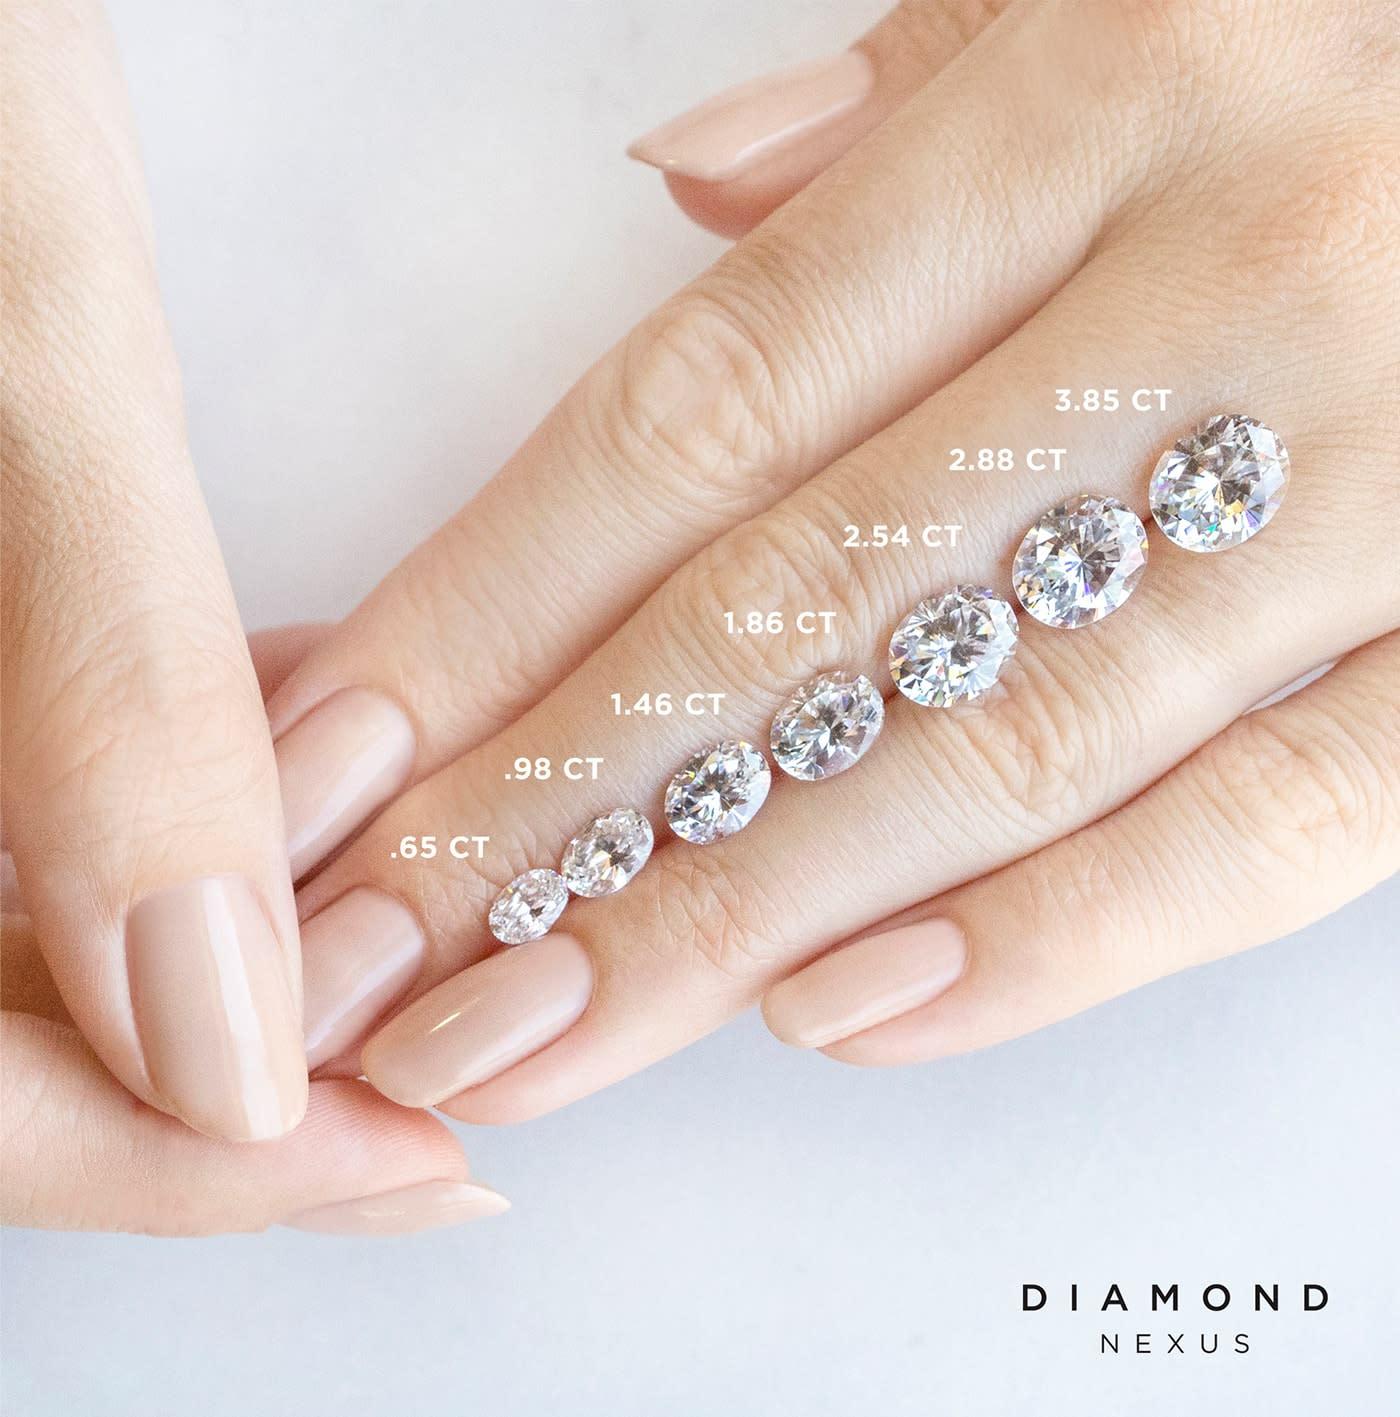 Loose Oval Nexus Diamond alternatives in various carat weights on a hand.